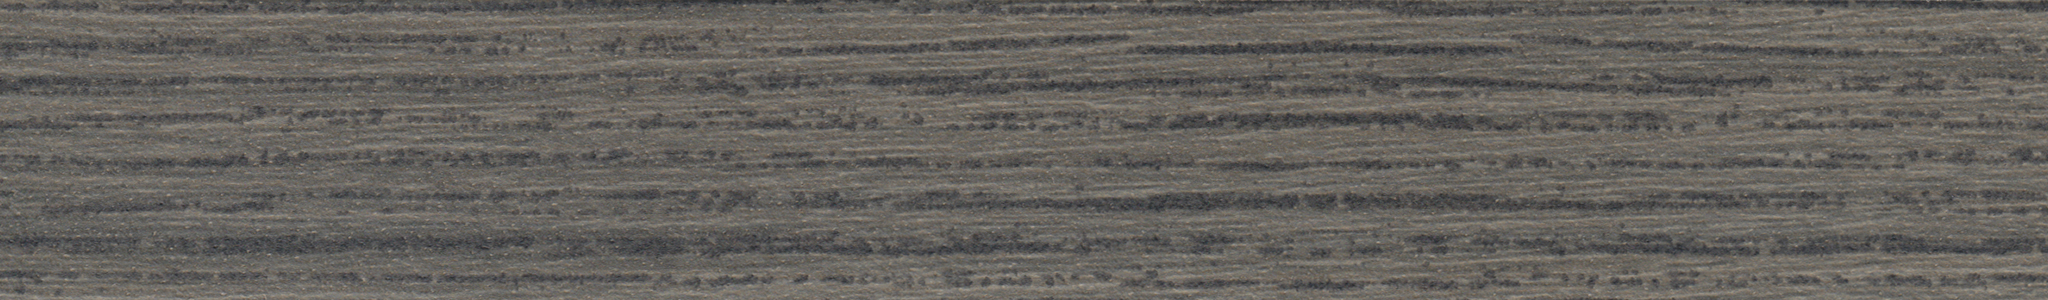 HD 241387 кромка ABS дуб графитовый жемчуг